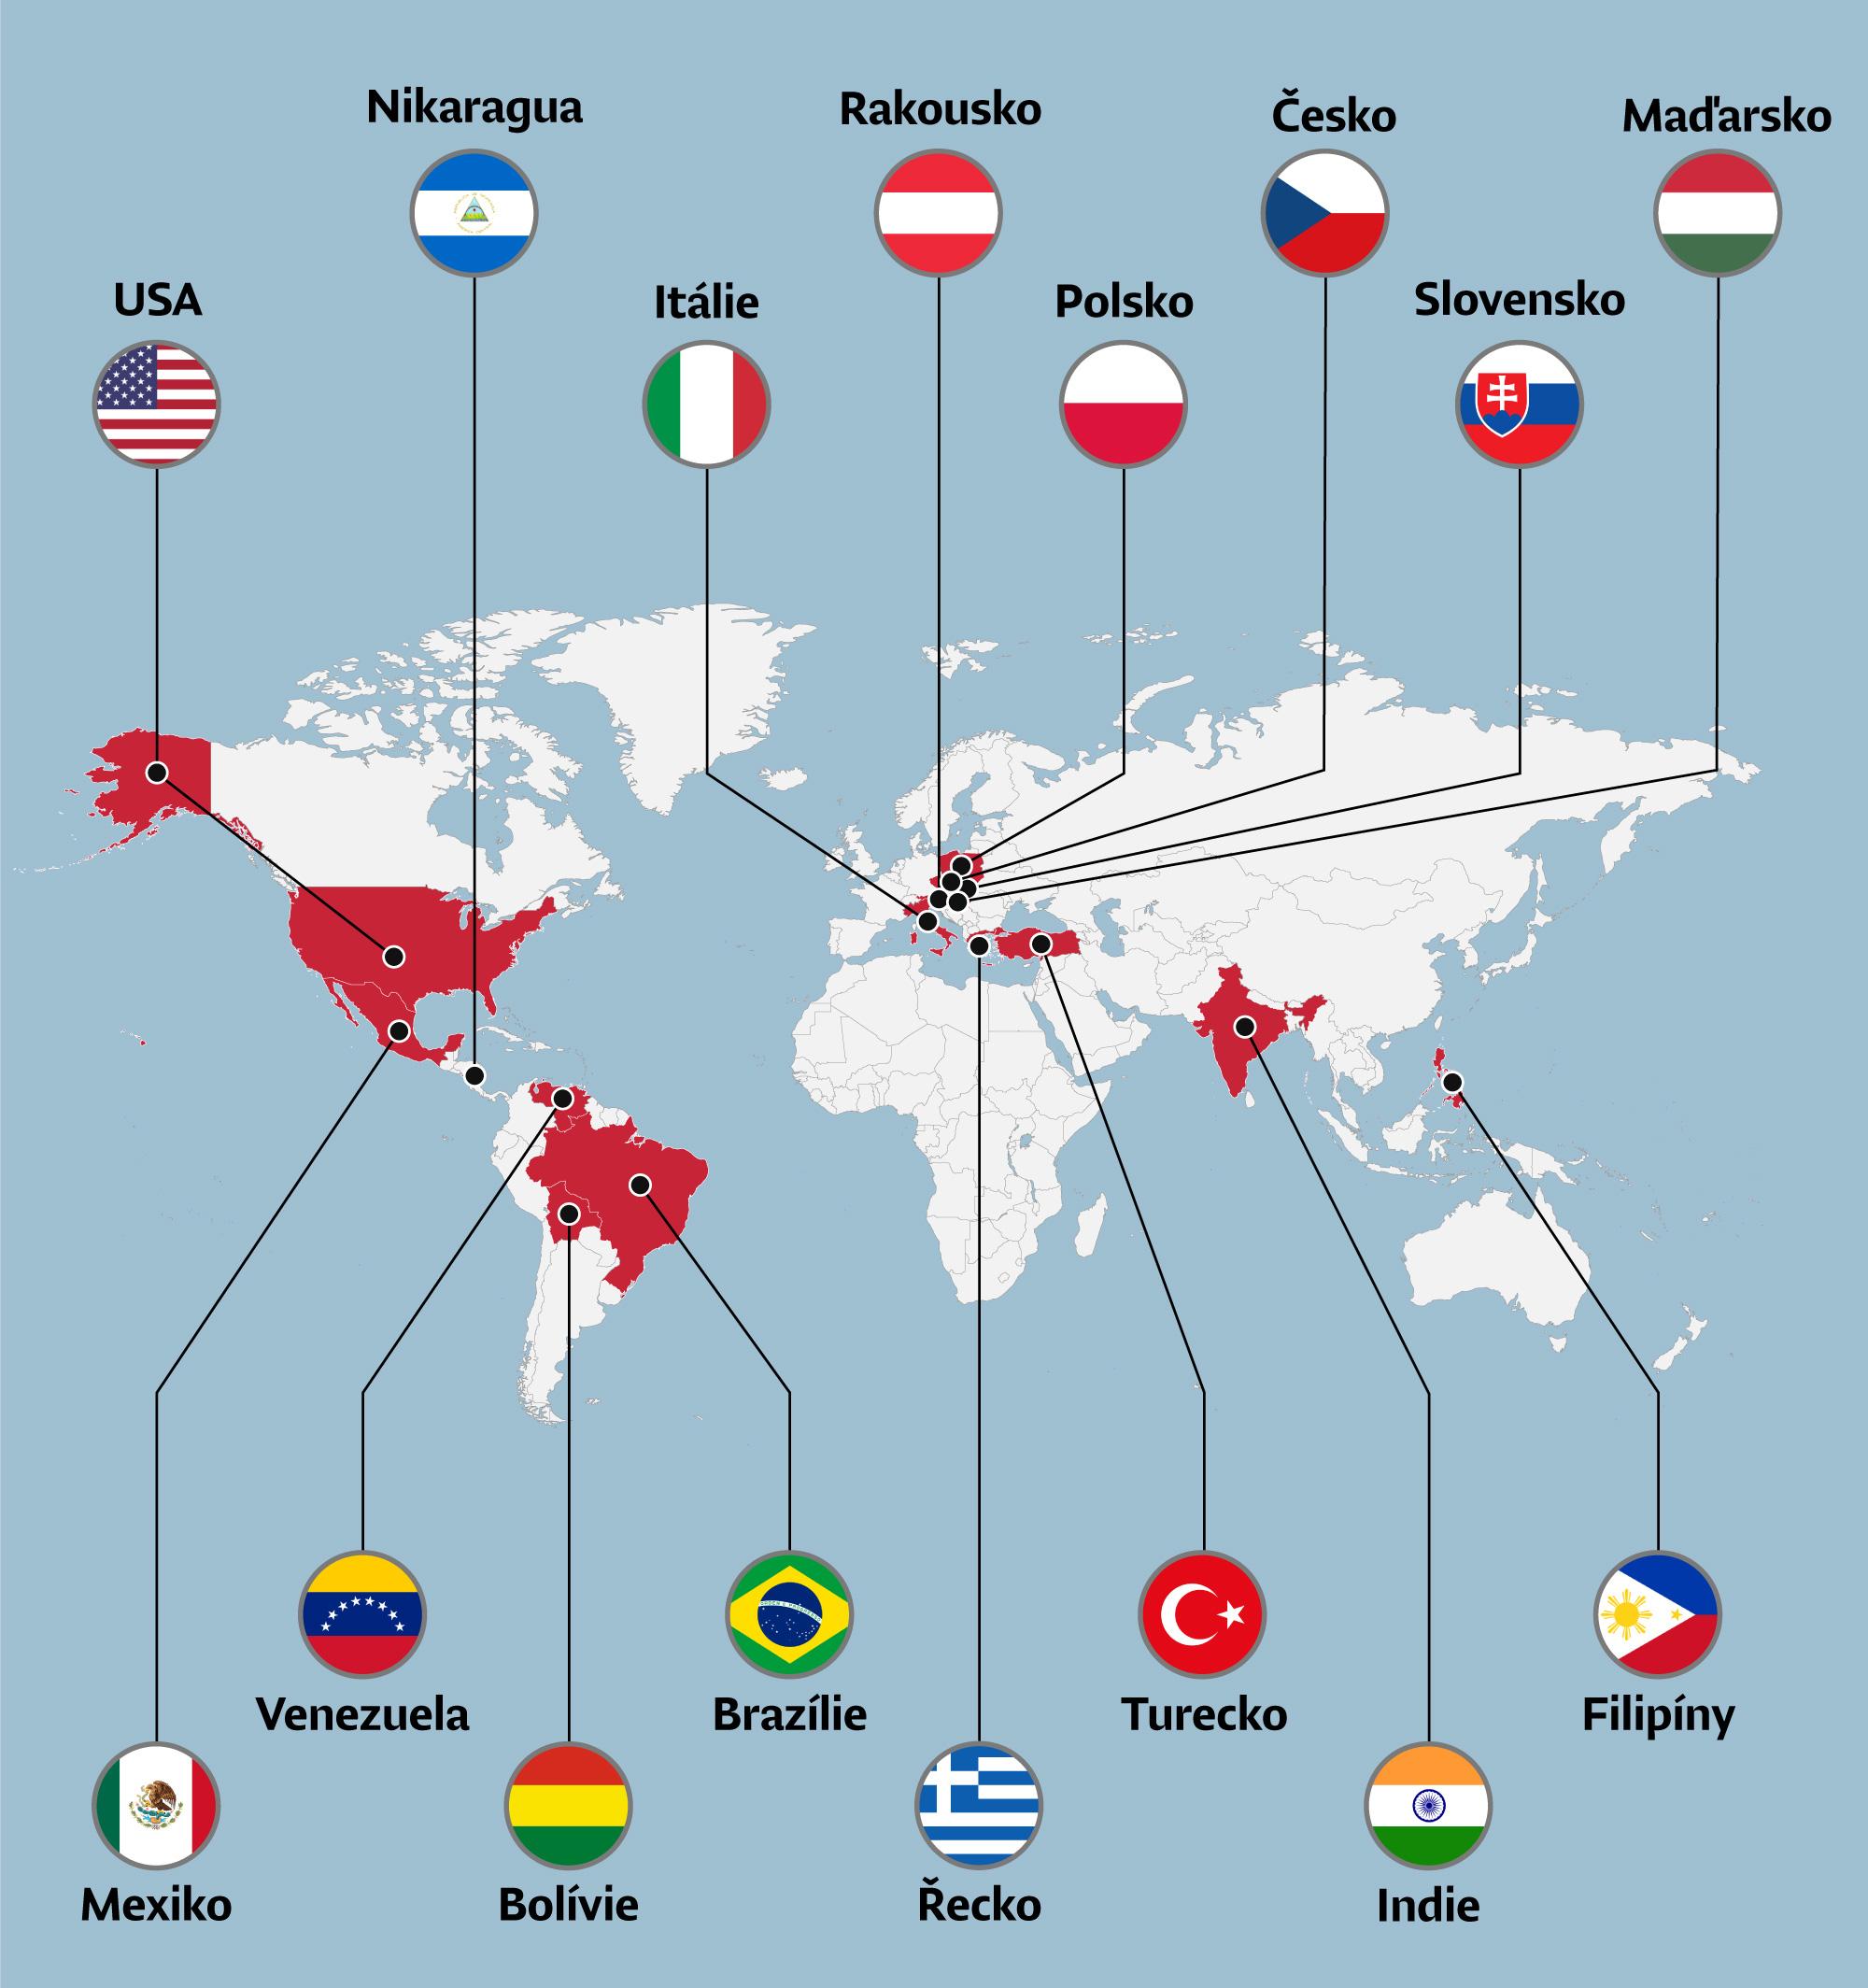 Brazilie Mapa Sveta Antiestablishmentu Se Rozrostla O Velkou Zemi